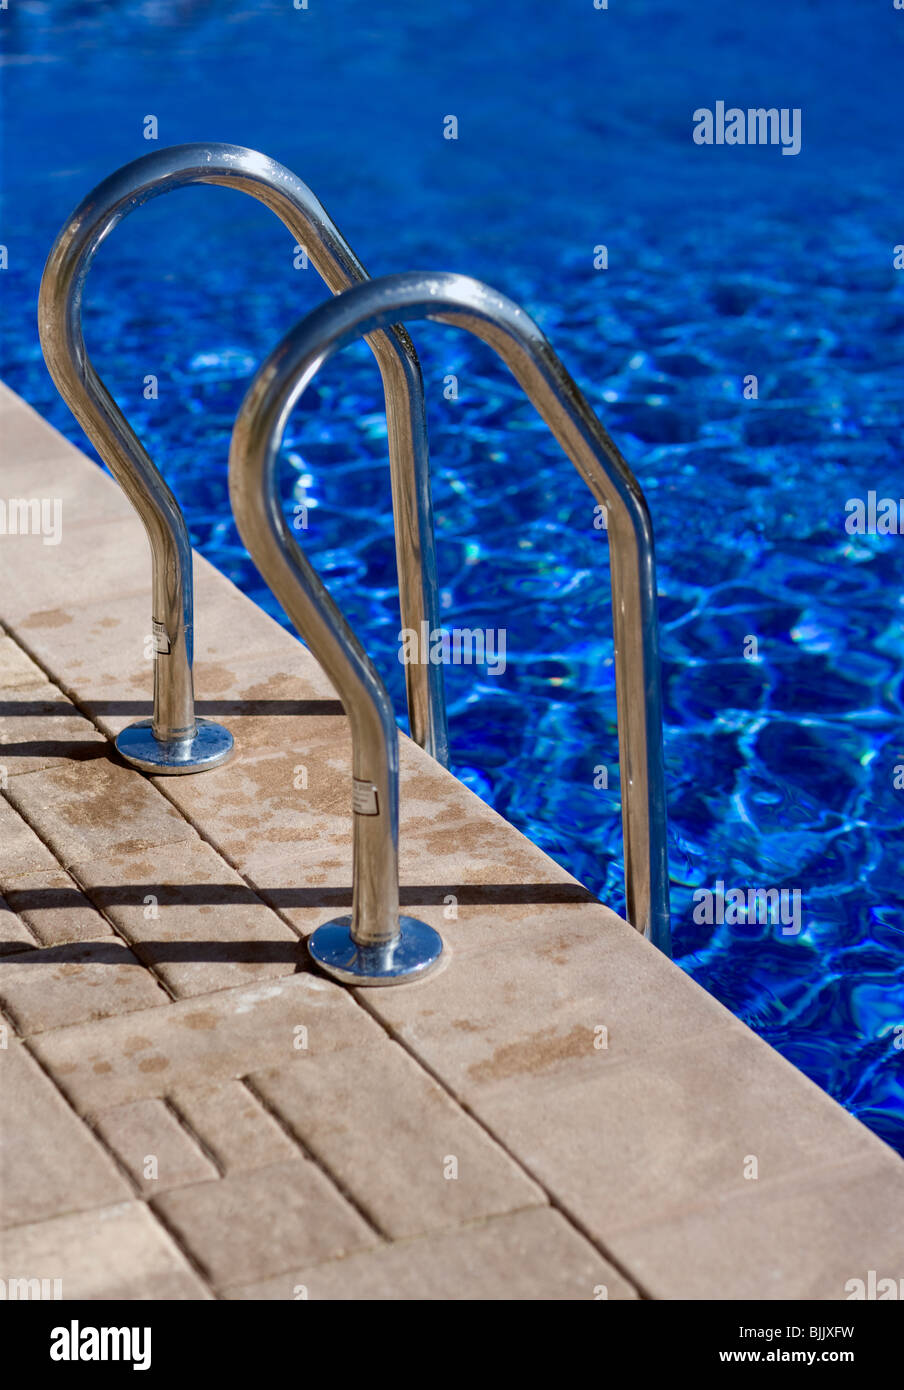 Swimming pool and ladder railings - Stock Image